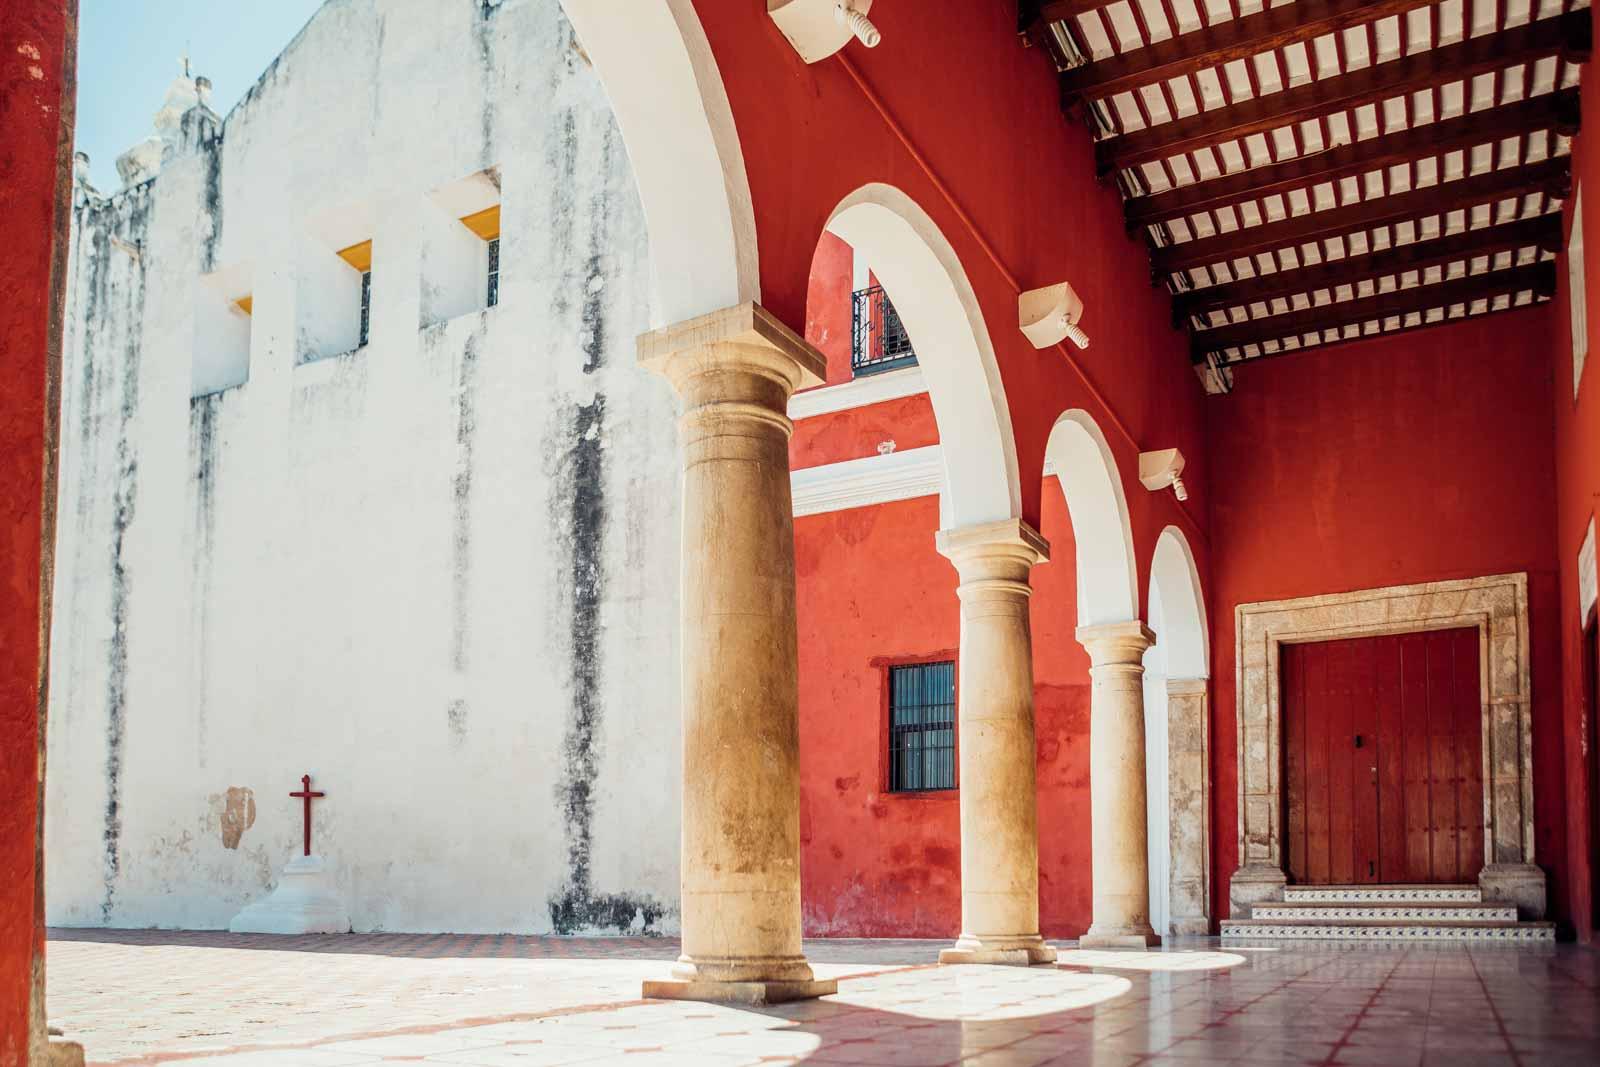 beautiful buildings of Campeche